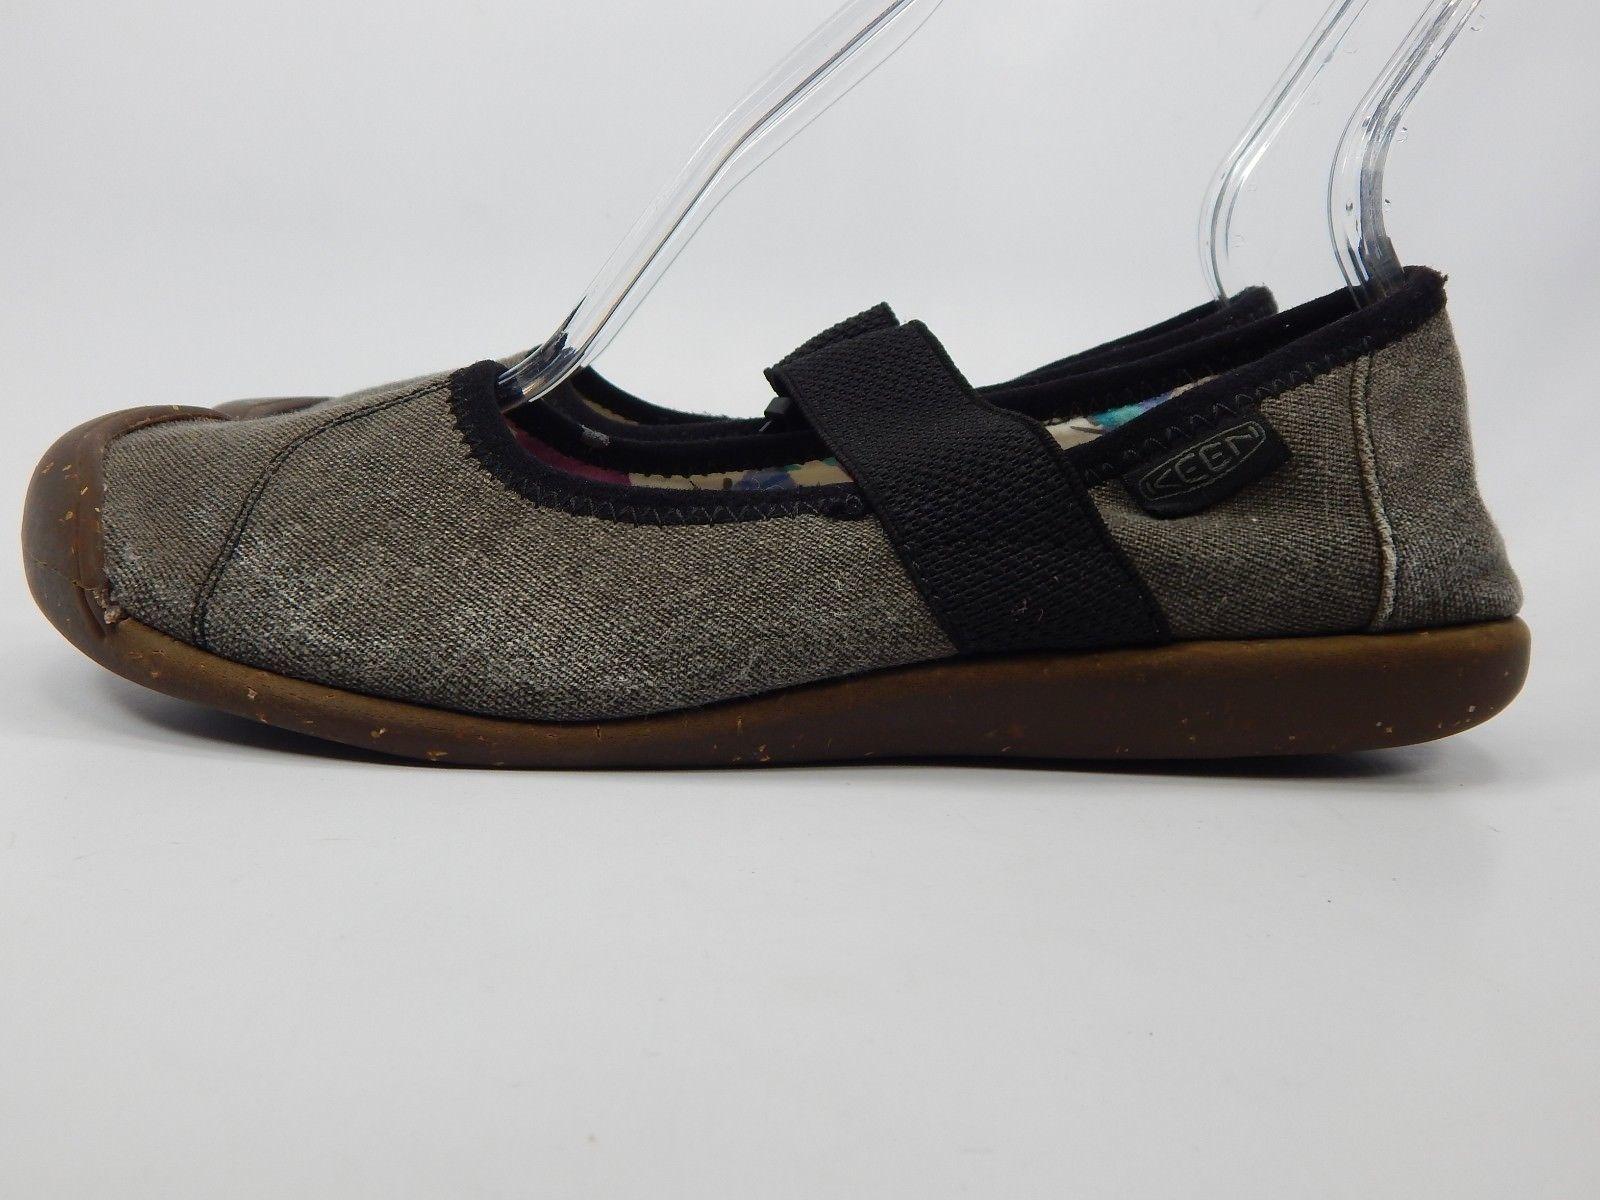 Keen Sienna Mary Jane Size: US 8.5 M (B) EU 39 Women's Canvas Shoe Black 1014731